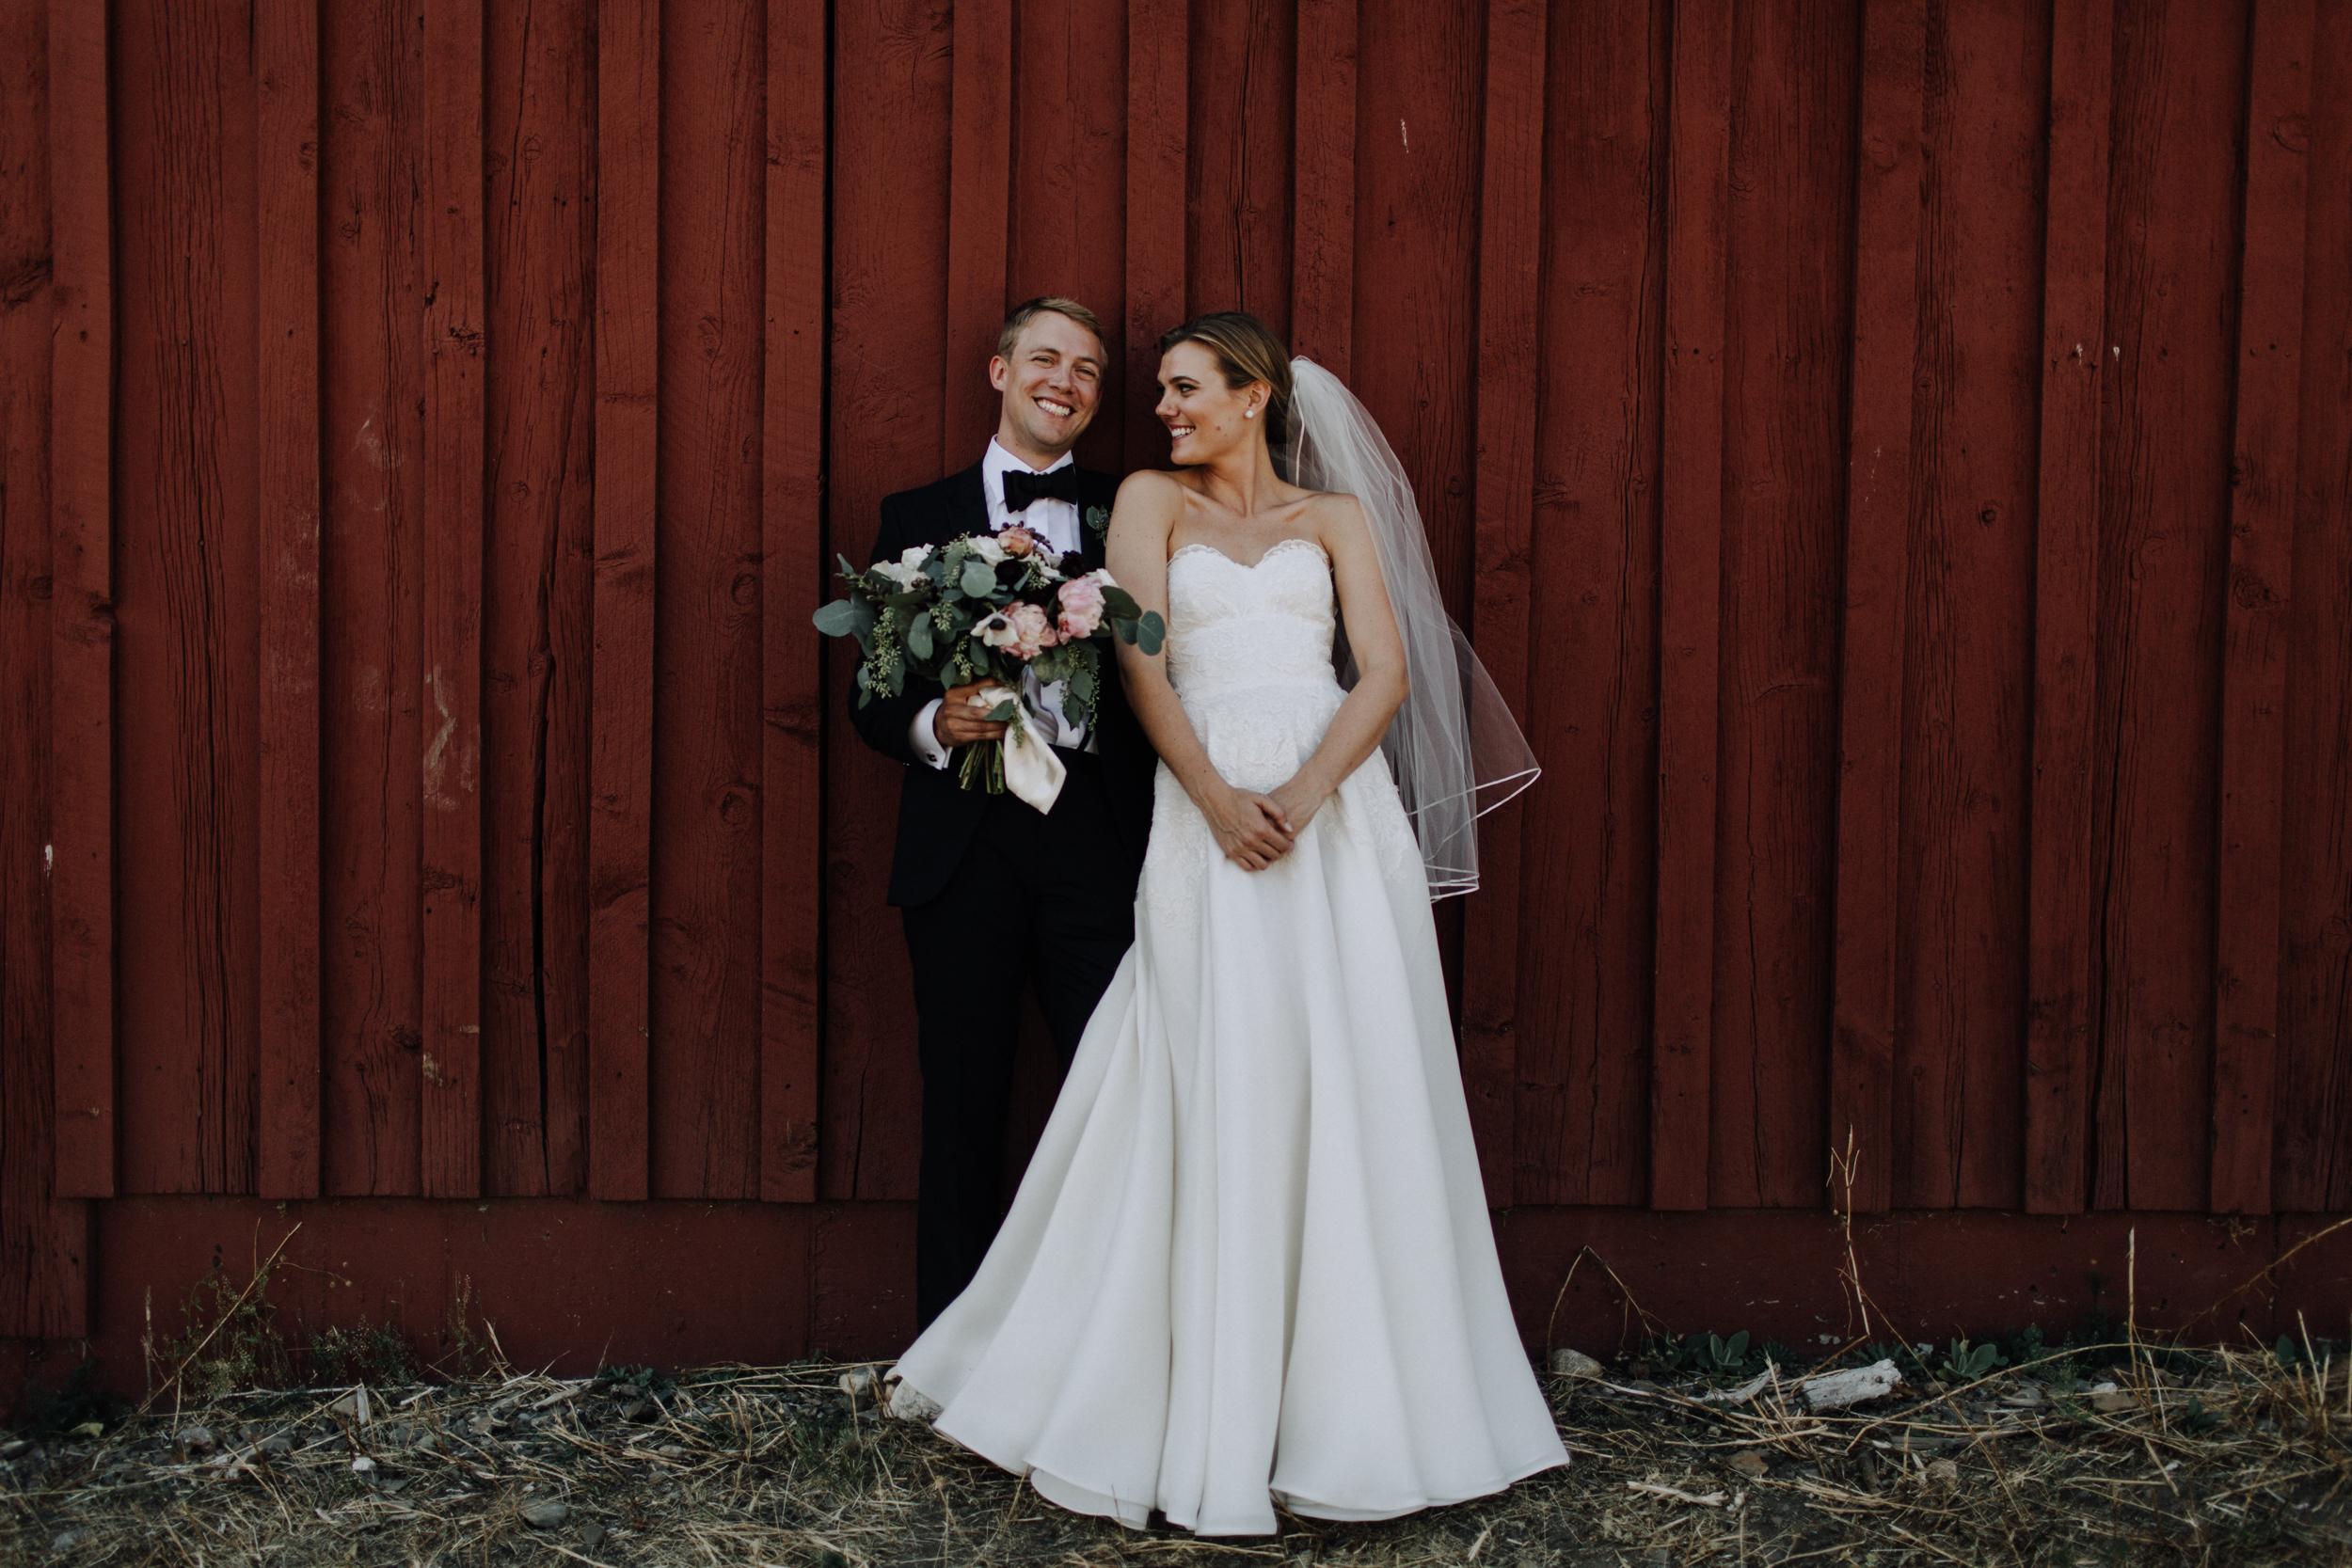 mad_Jon_Sun_valley_idaho_wedding-53.jpg